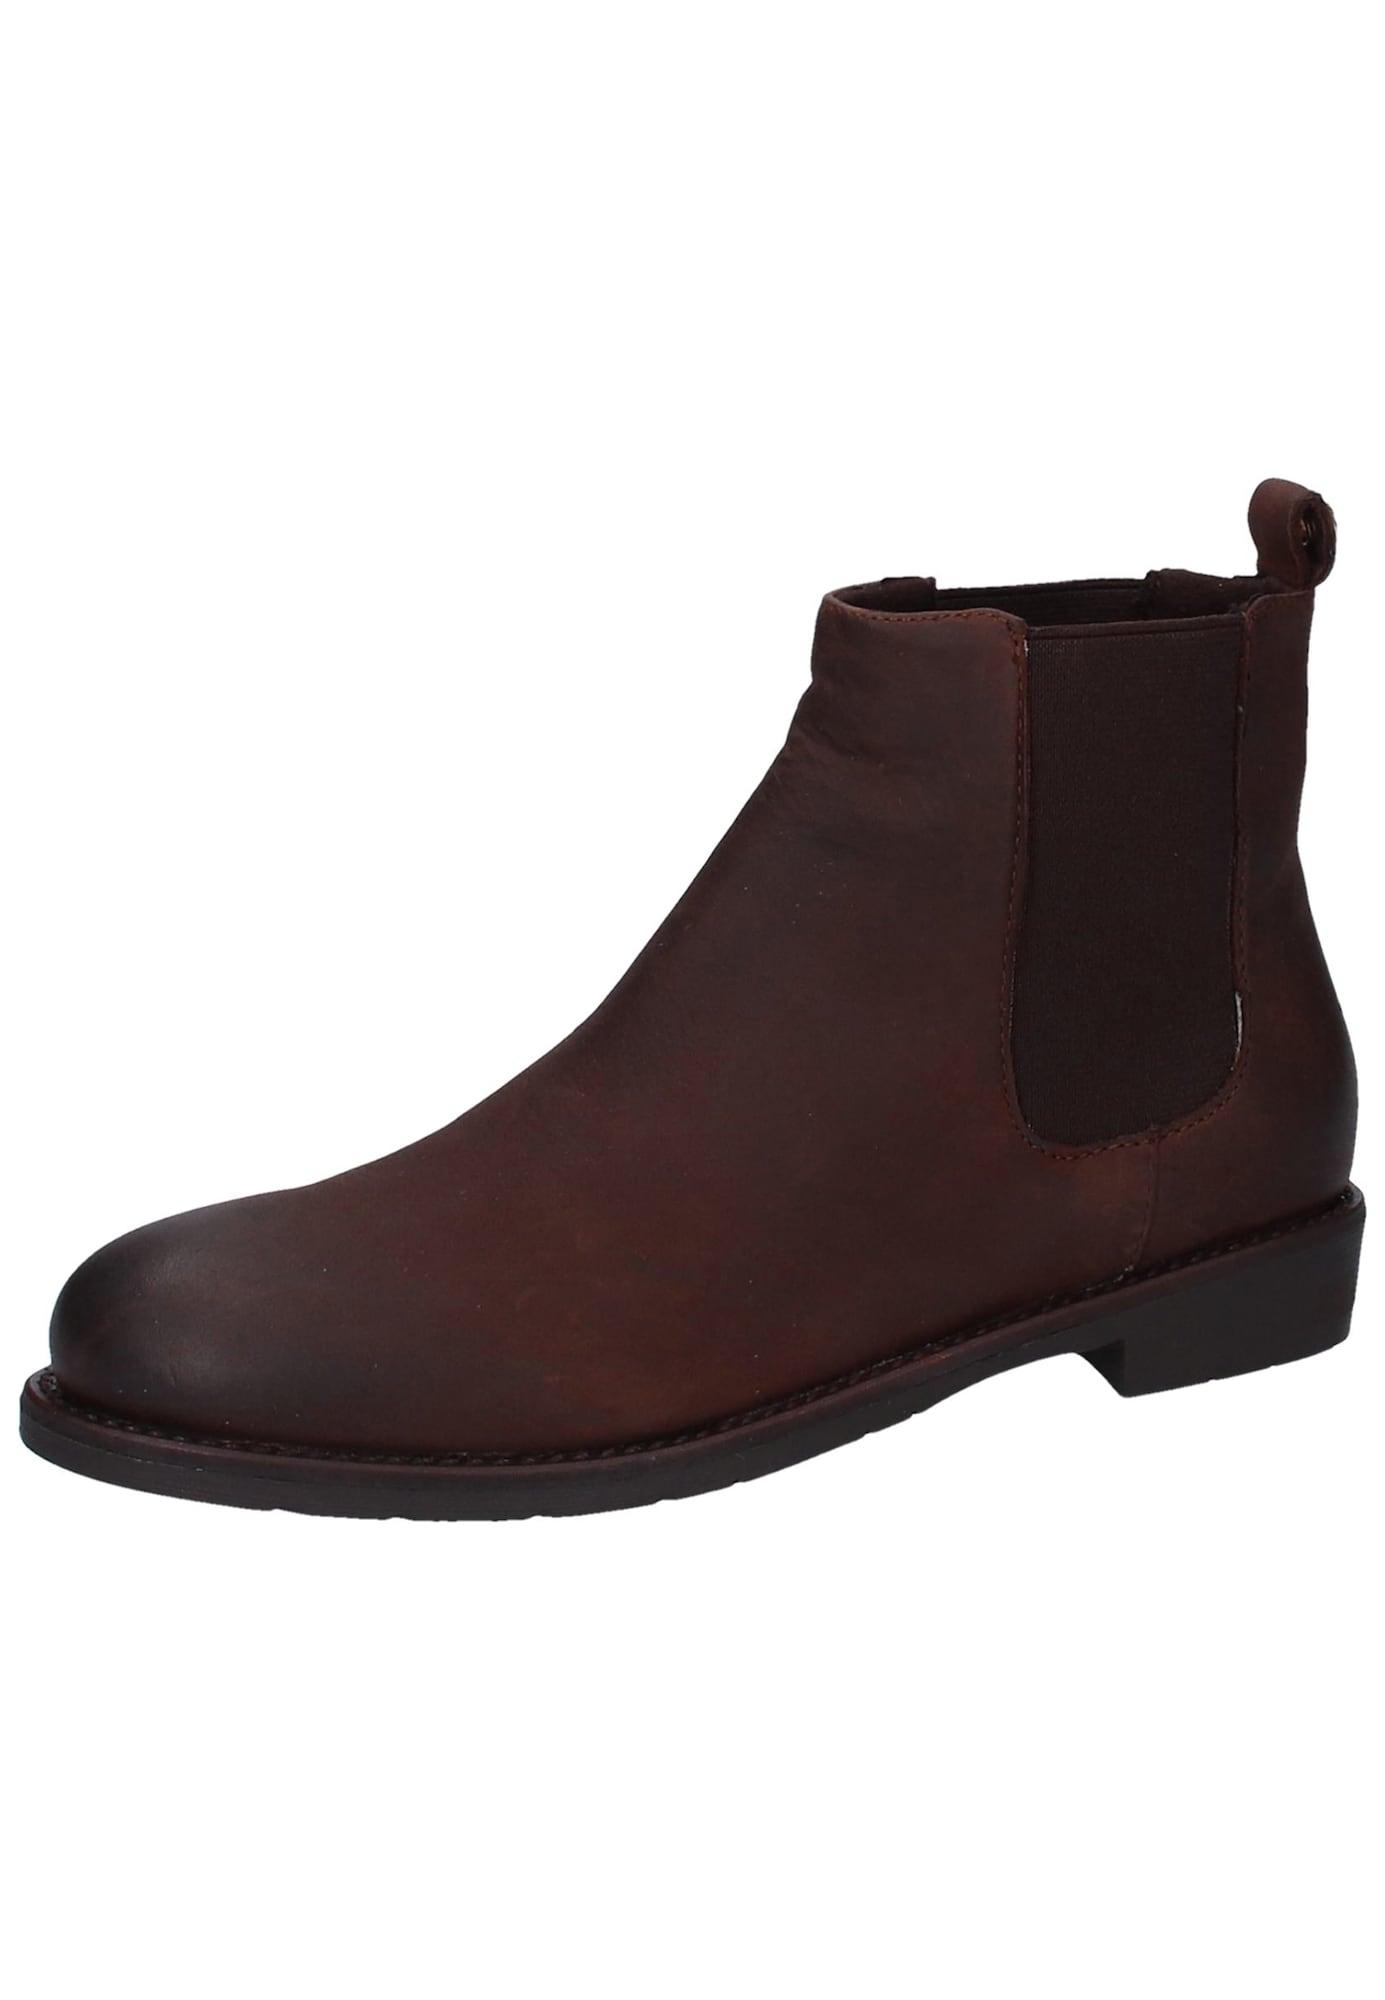 Chelsea boty Chelstro tmavě hnědá SPM